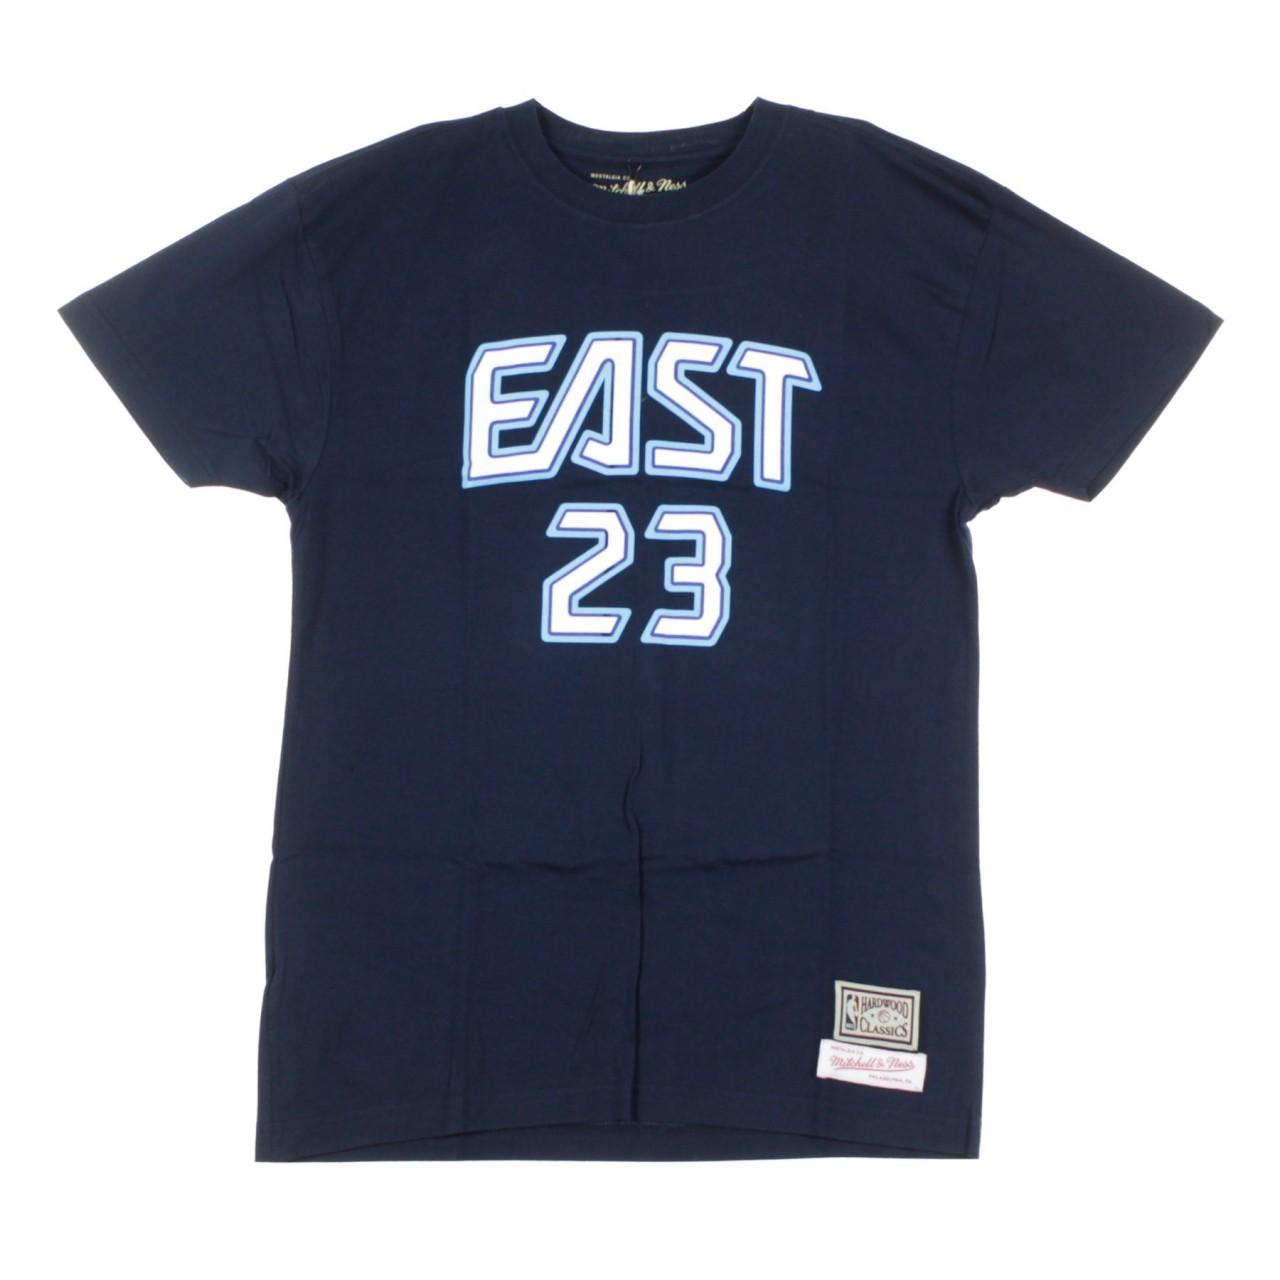 MITCHELL & NESS NBA NAME & NUMBER TEE NO.23 LEBRON JAMES ALL STAR EAST 2009 BNN3SC18158-ASENAVY09LJA